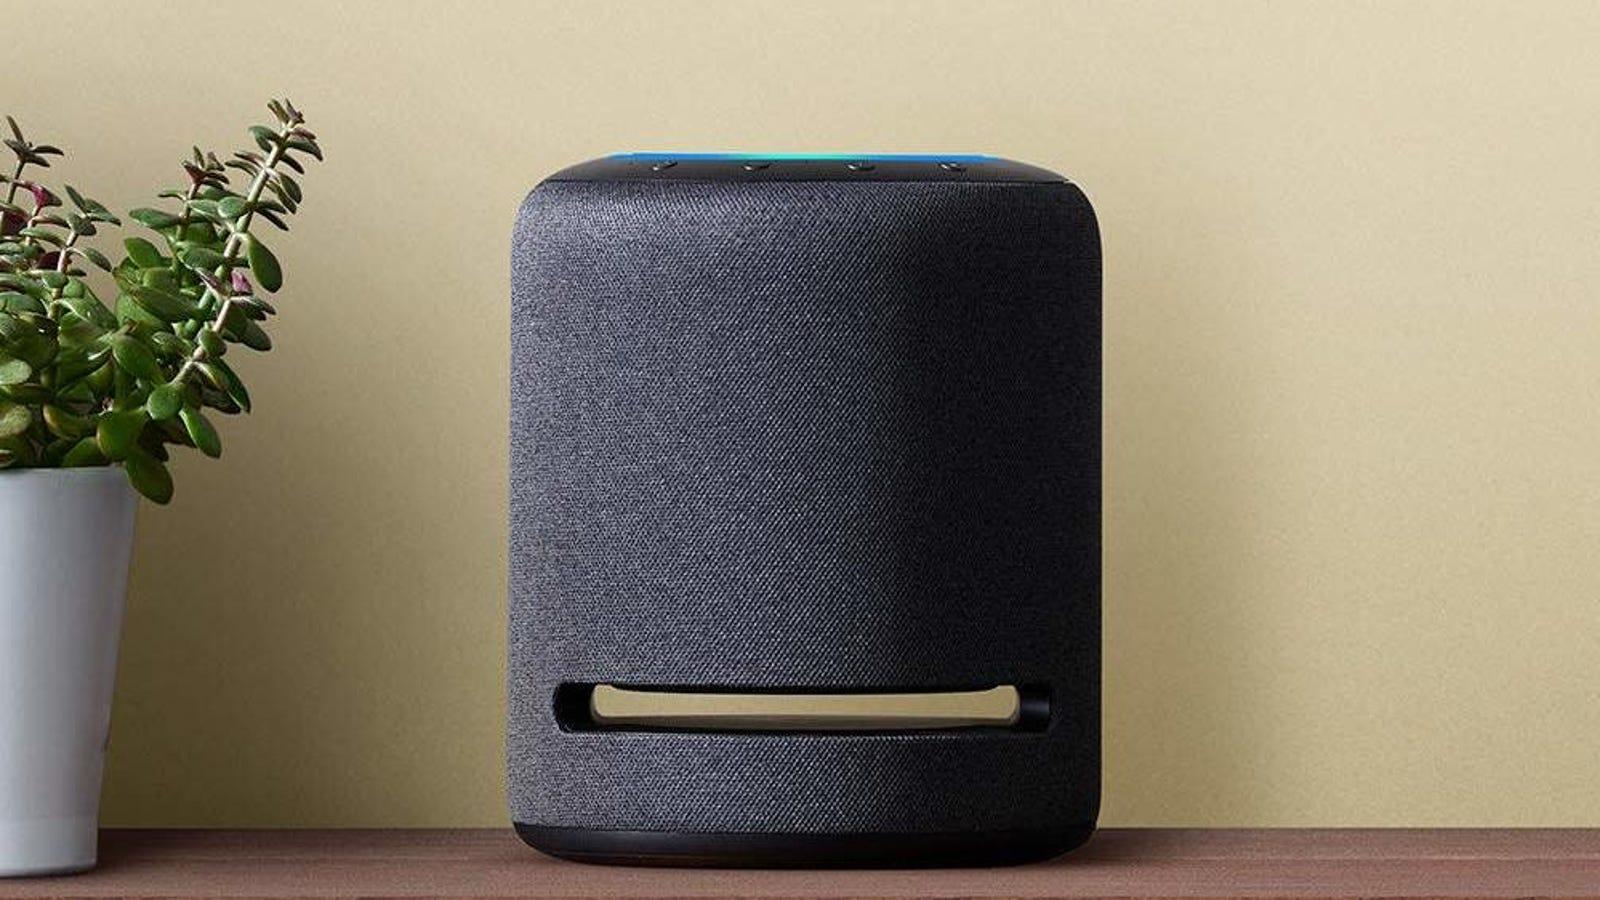 How Amazon's New Echo Studio Compares to Other Smart Speakers